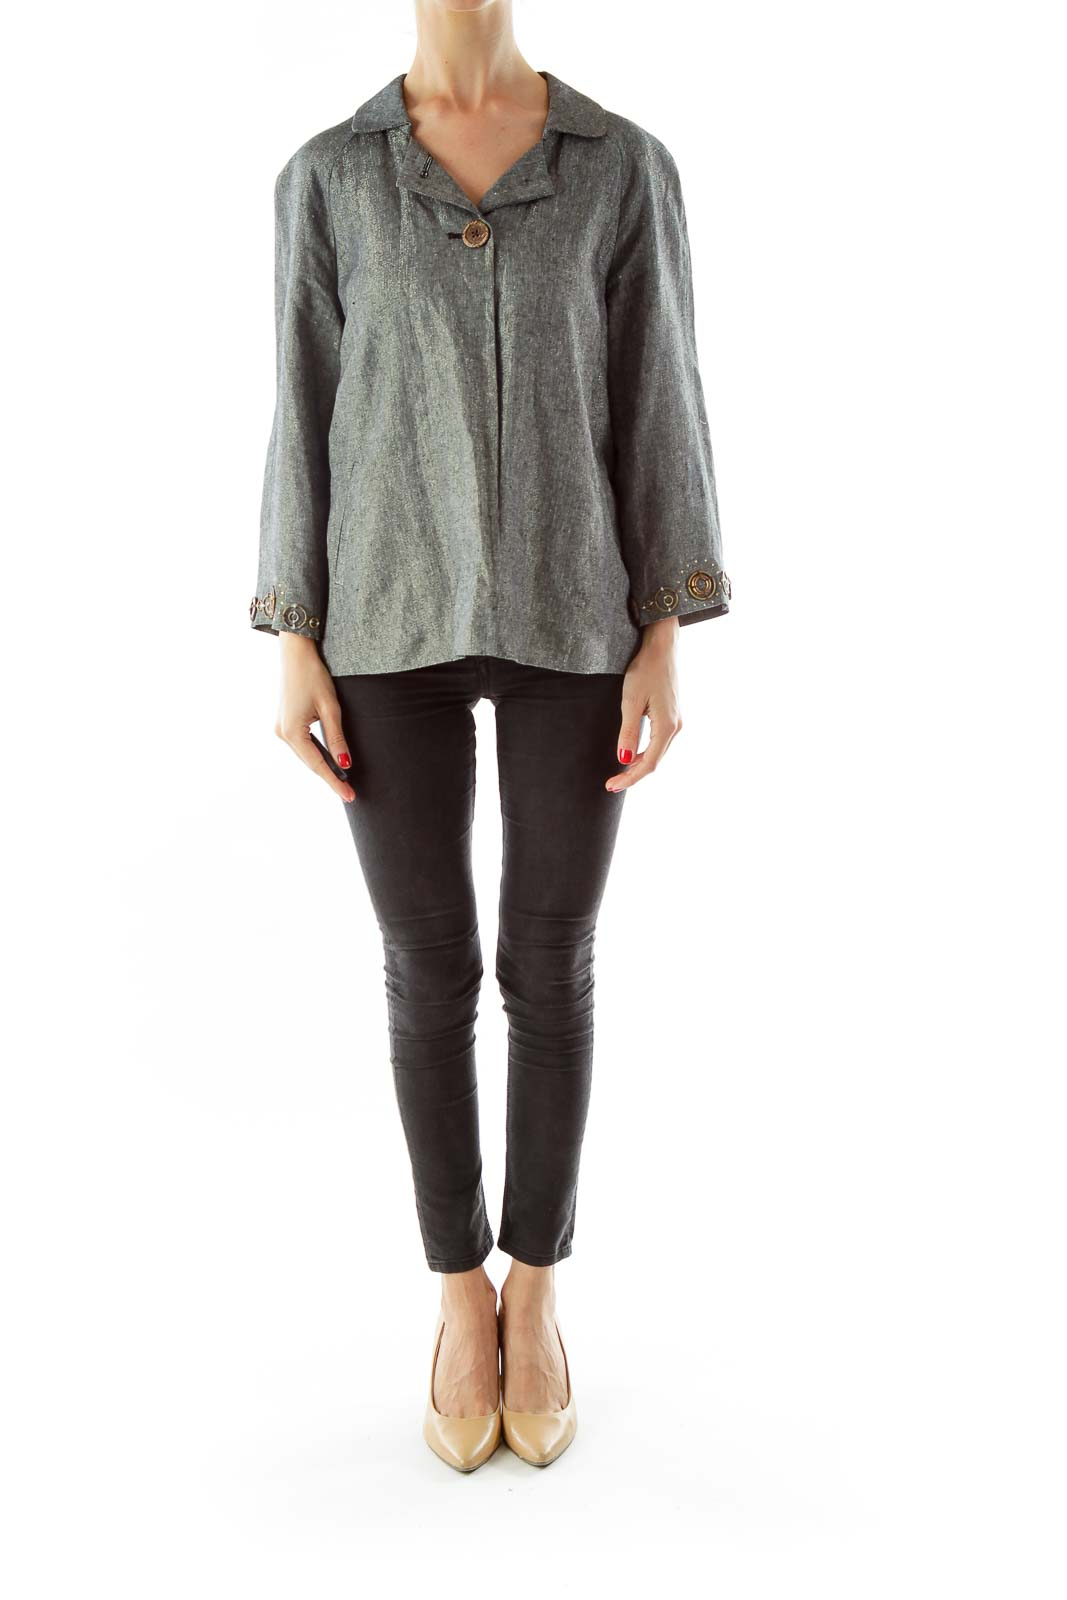 Gray Metallic Blazer